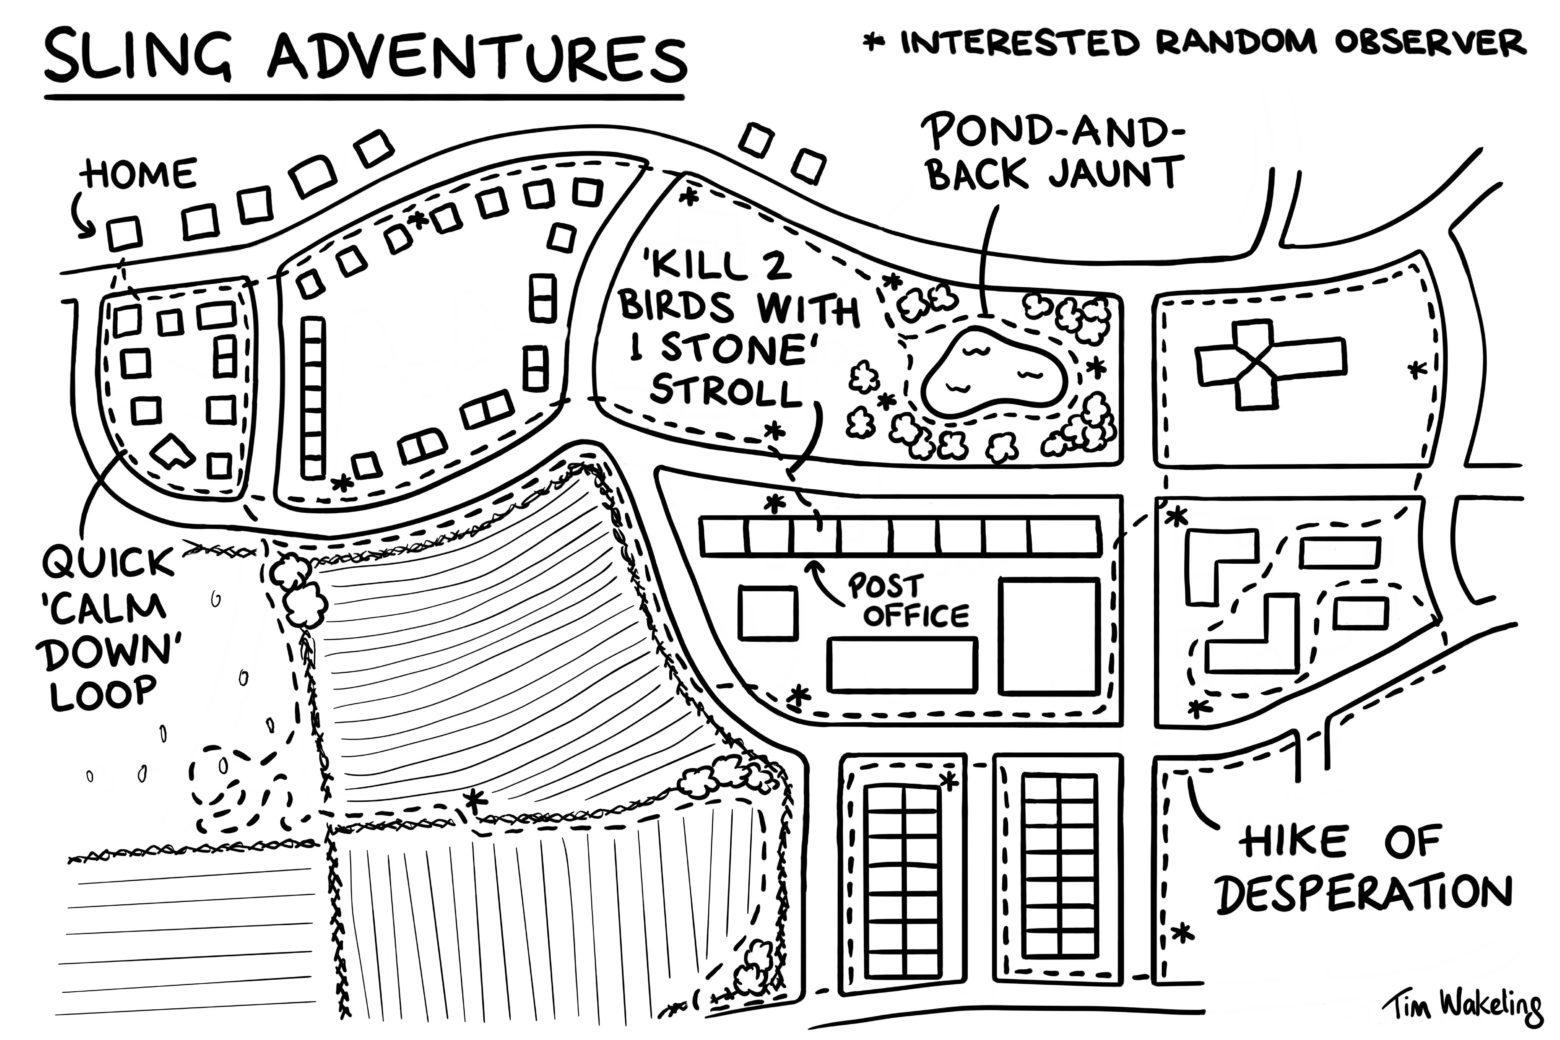 Sling adventures